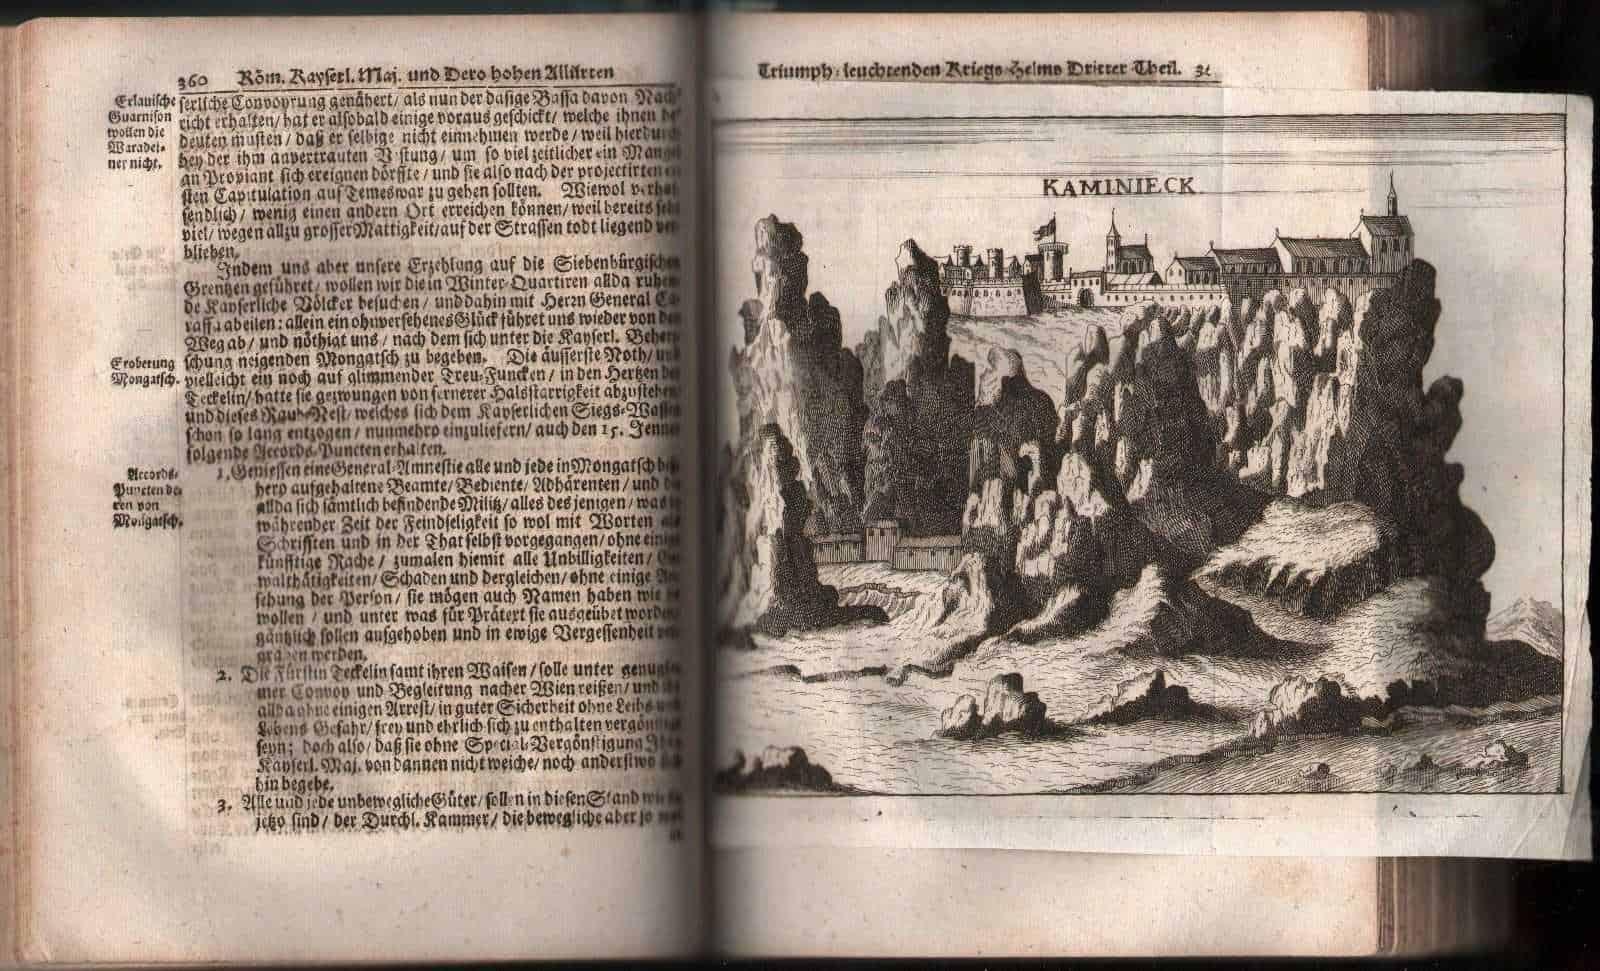 1688-Boethius-TRIUMPH-LEUCHTENDEN-KRIEGS-HELMS-Vol-3-History-Christian-Ottoman-401133054023-9